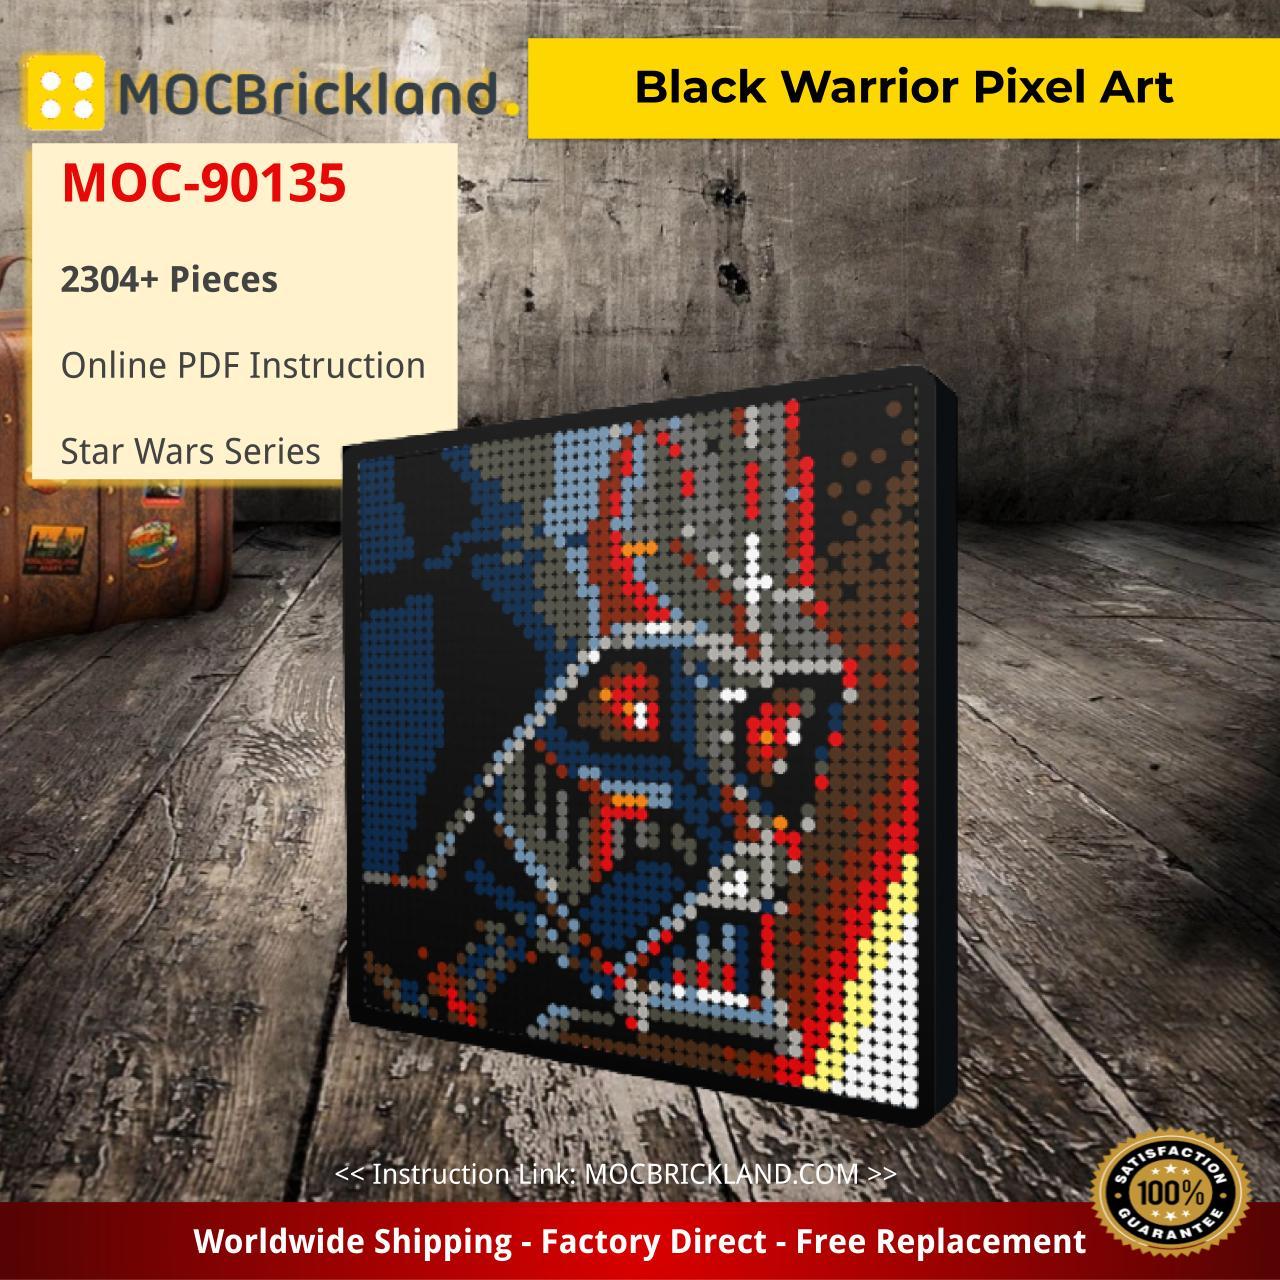 Black Warrior Pixel Art Star Wars MOC-90135 with 2304 pieces